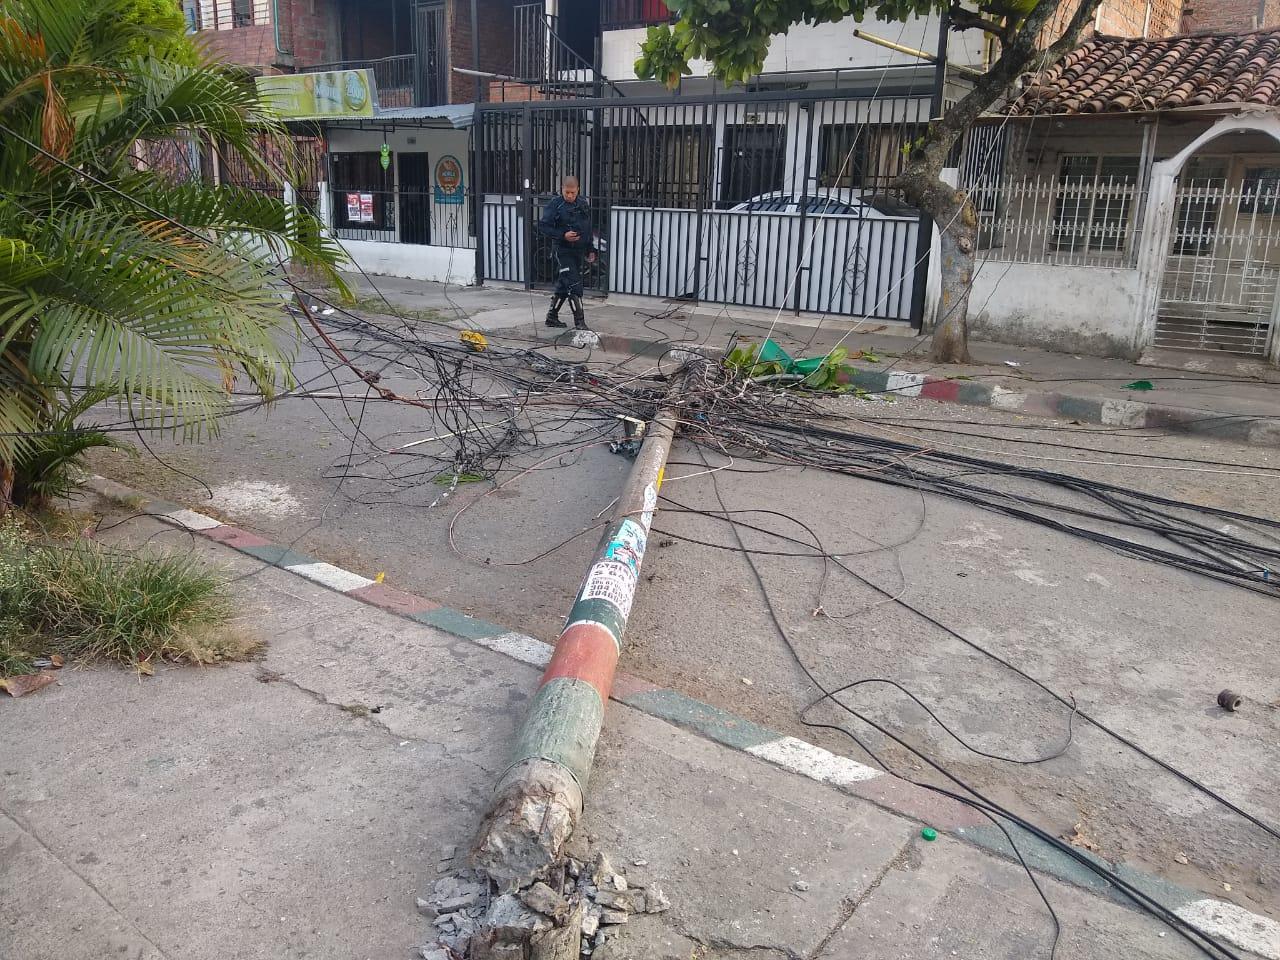 Conductor de camión que estaría huyendo de robo tumbó 7 postes en barrio de Cali